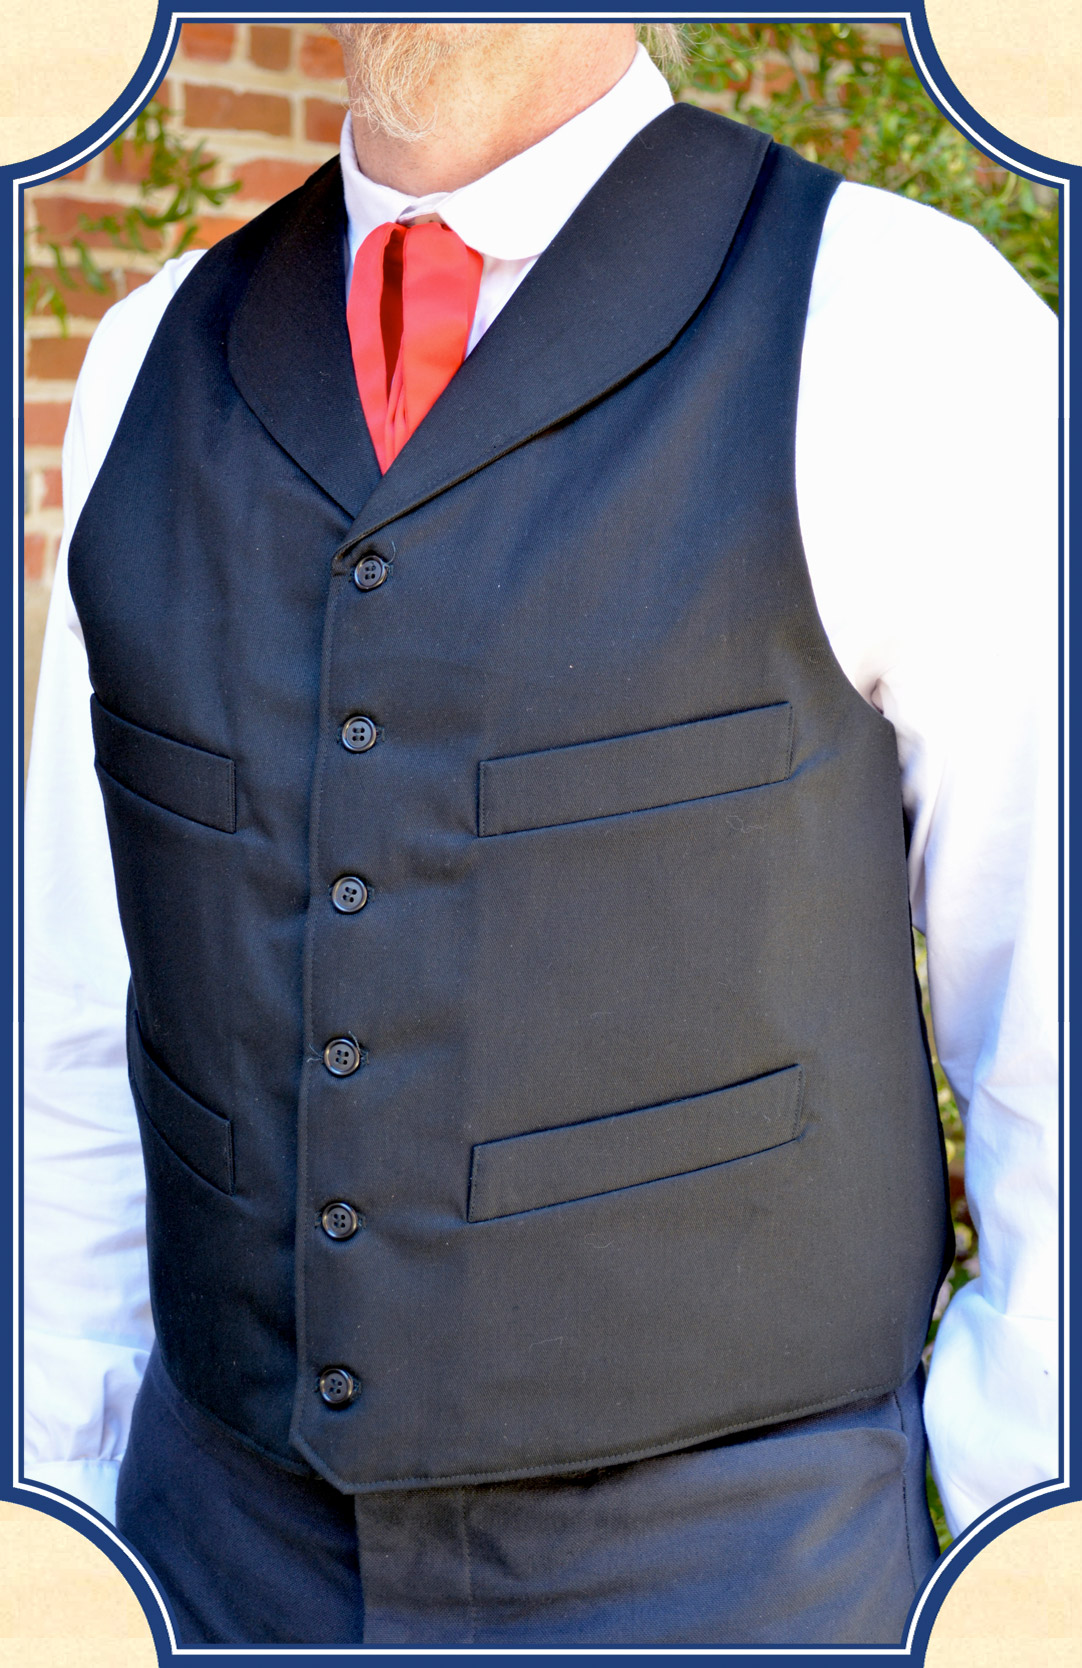 Brown Herringbone Wool Vest - Damanino   Bespoke Suit and